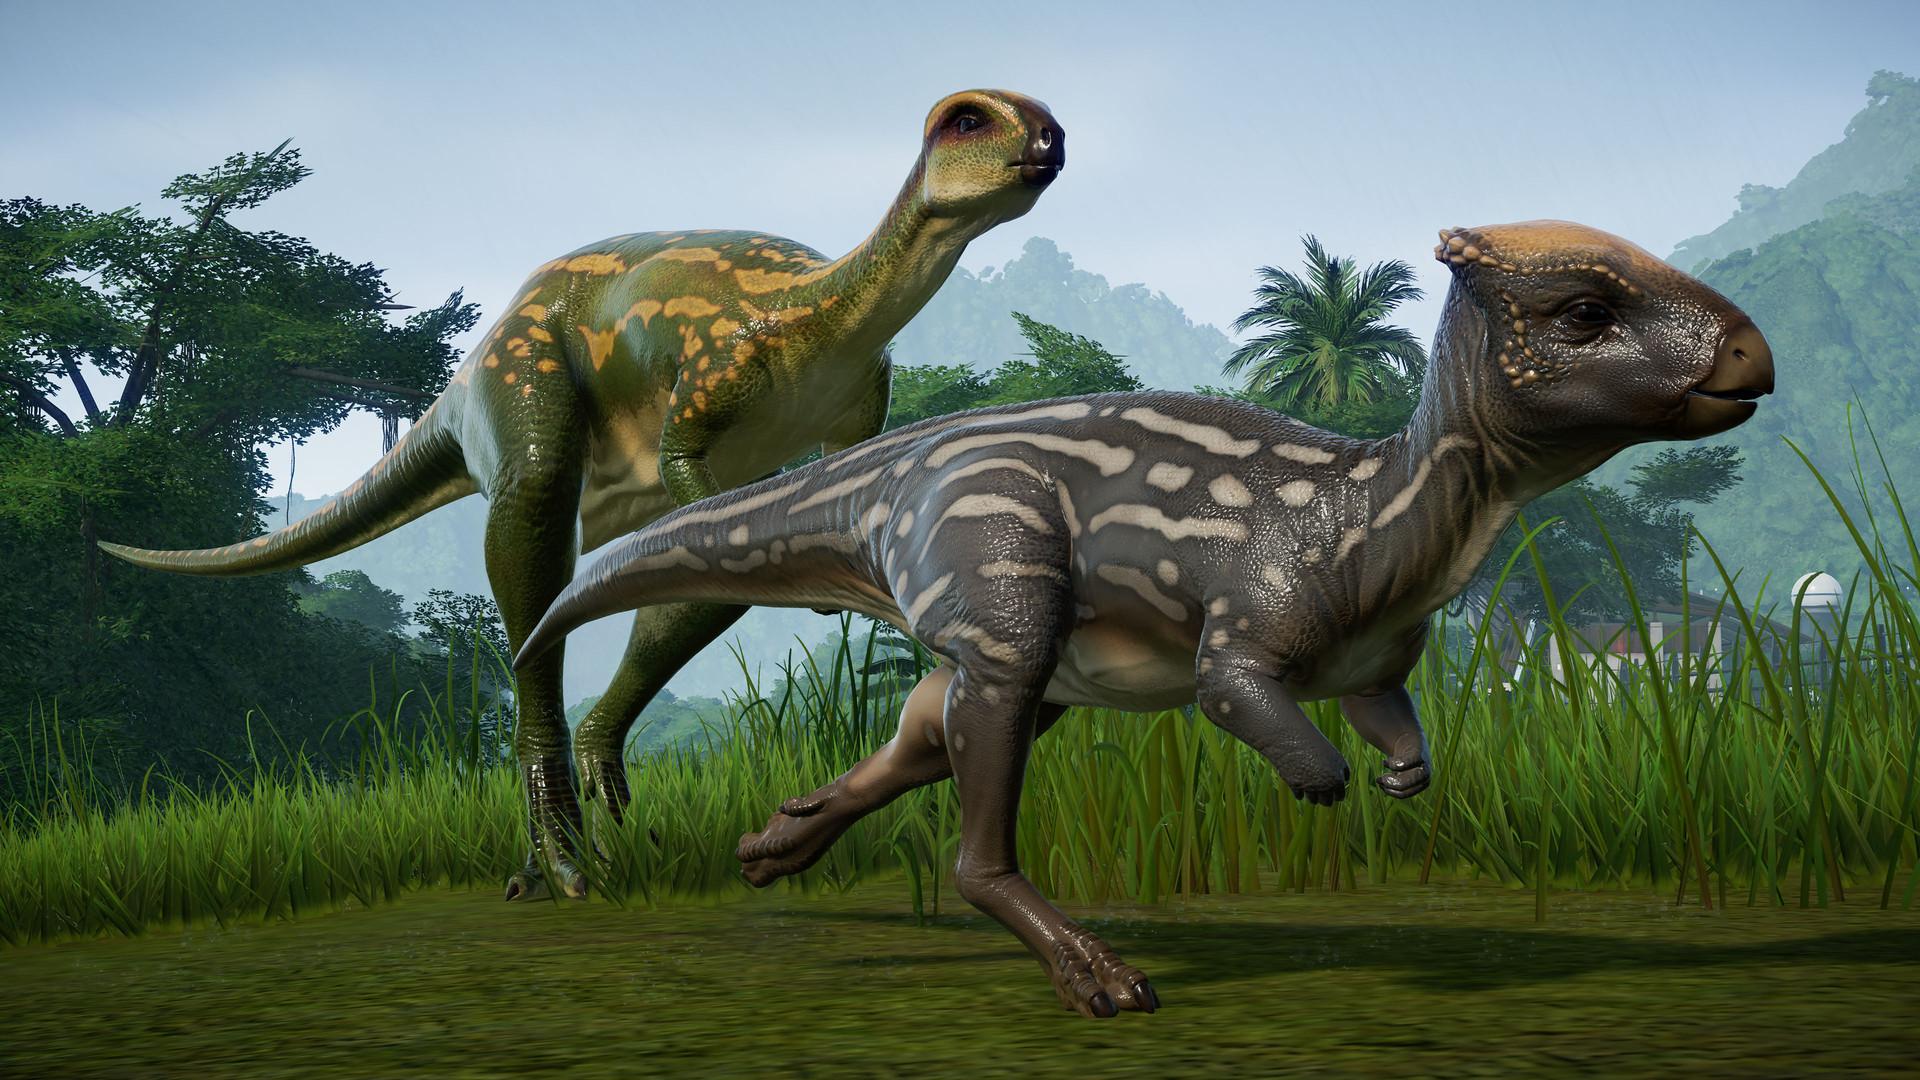 Jurassic World Evolution - Update 1.10 and Herbivore Dinosaur Pack